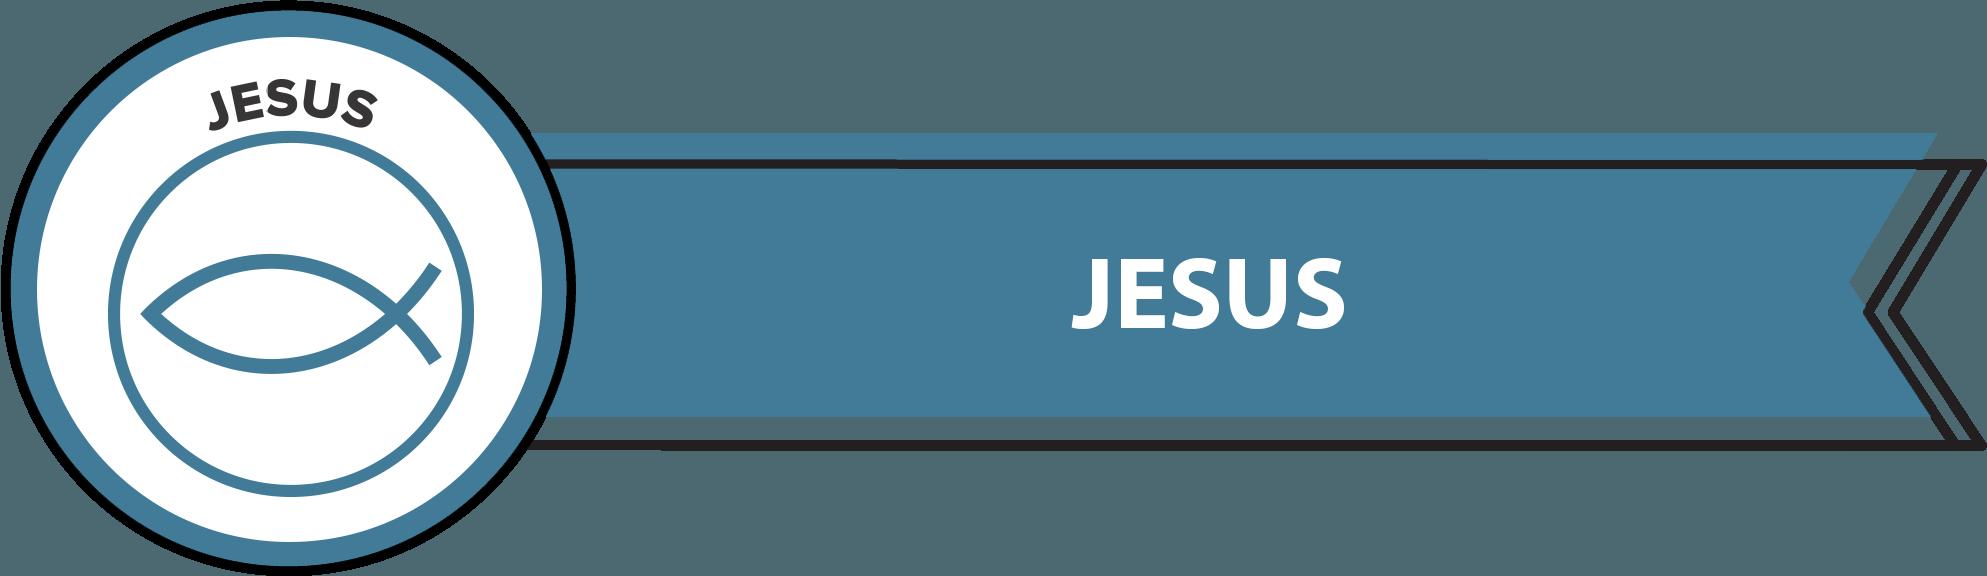 Jesus Concept